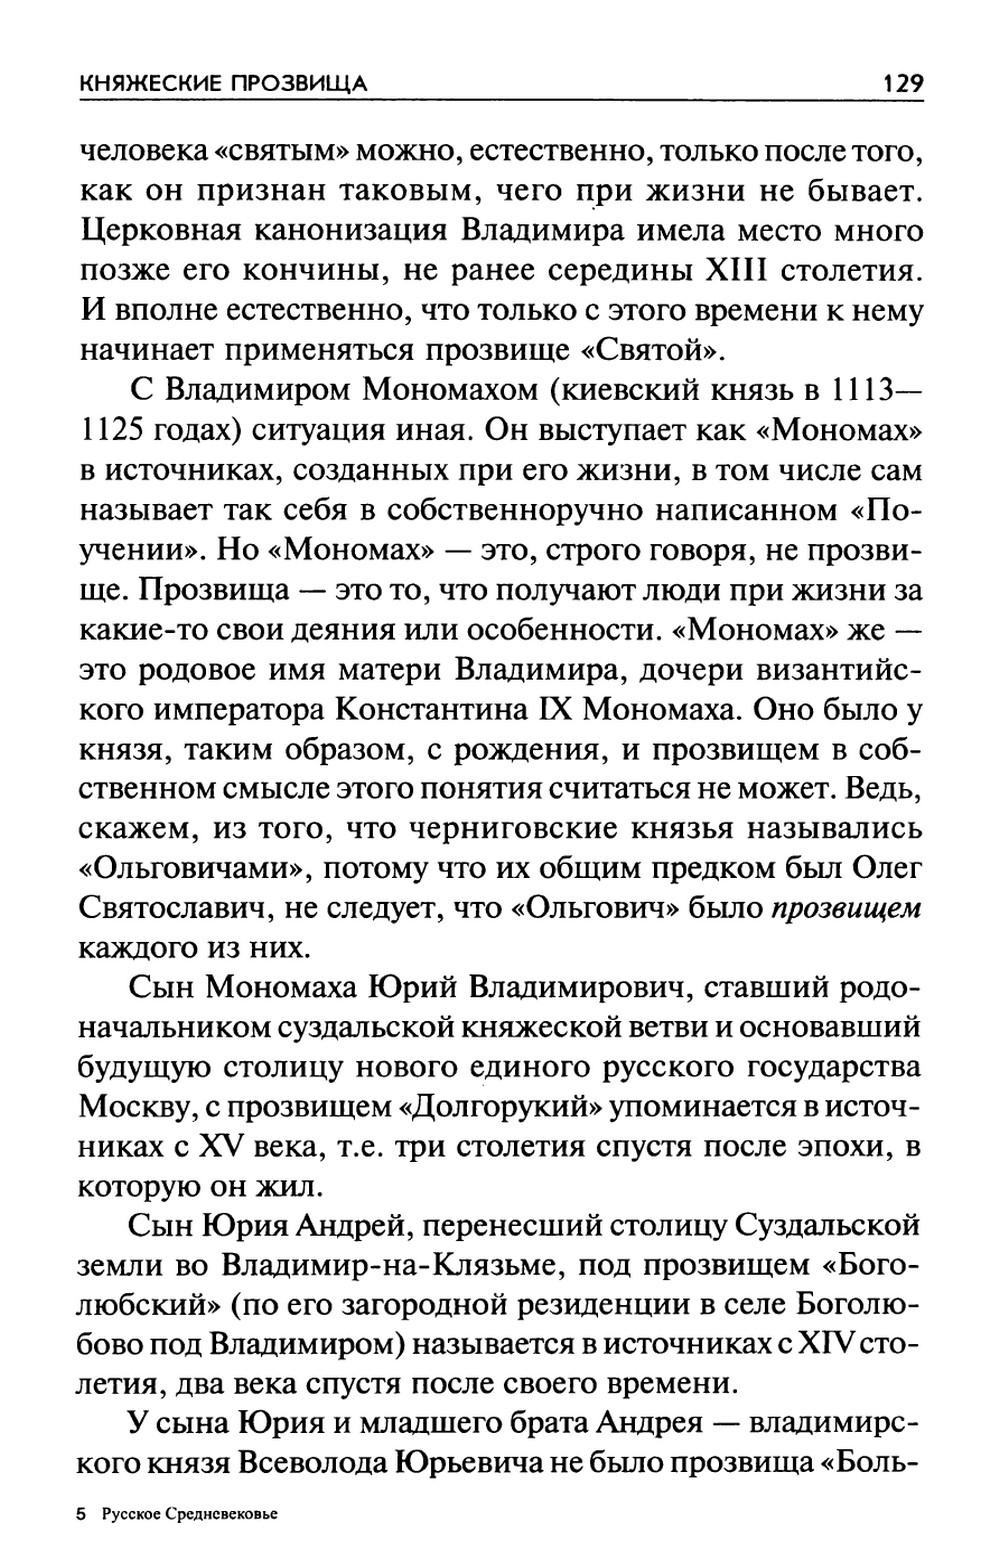 http://i1.imageban.ru/out/2013/10/02/98a50cb62e39d1e6e4b61c32a0243a2d.jpg